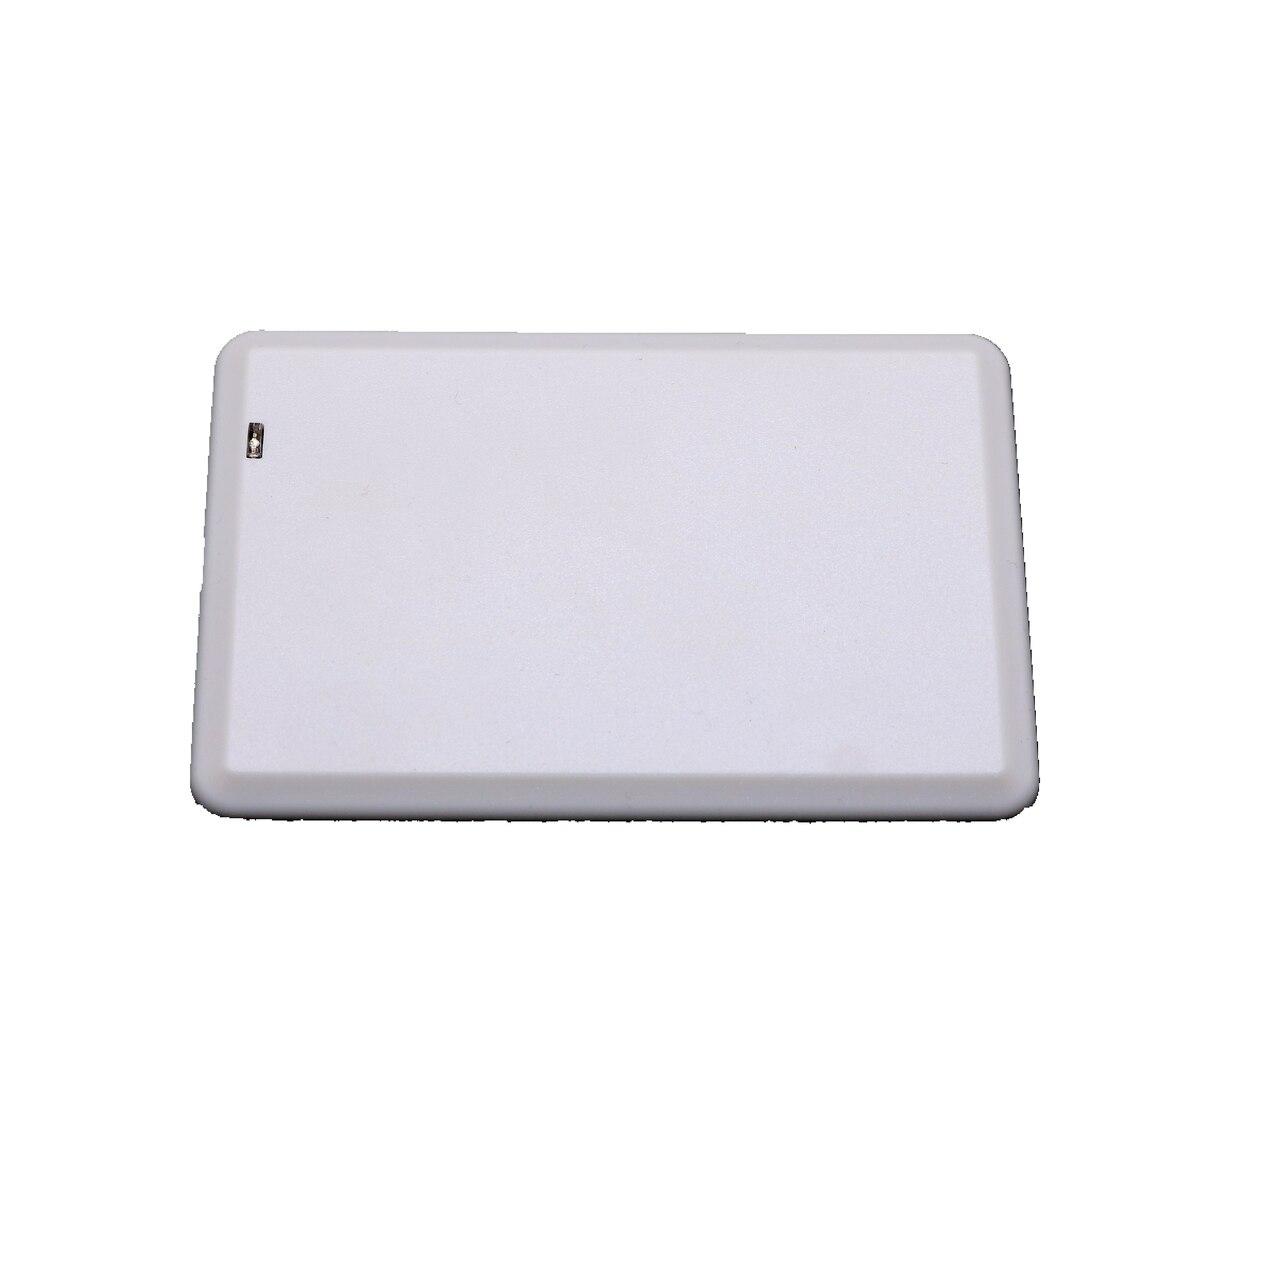 UHF USB Reader ISO18000-6C(EPC G2) 6B Read Write 920Mhz 925MhzUHF USB Reader ISO18000-6C(EPC G2) 6B Read Write 920Mhz 925Mhz